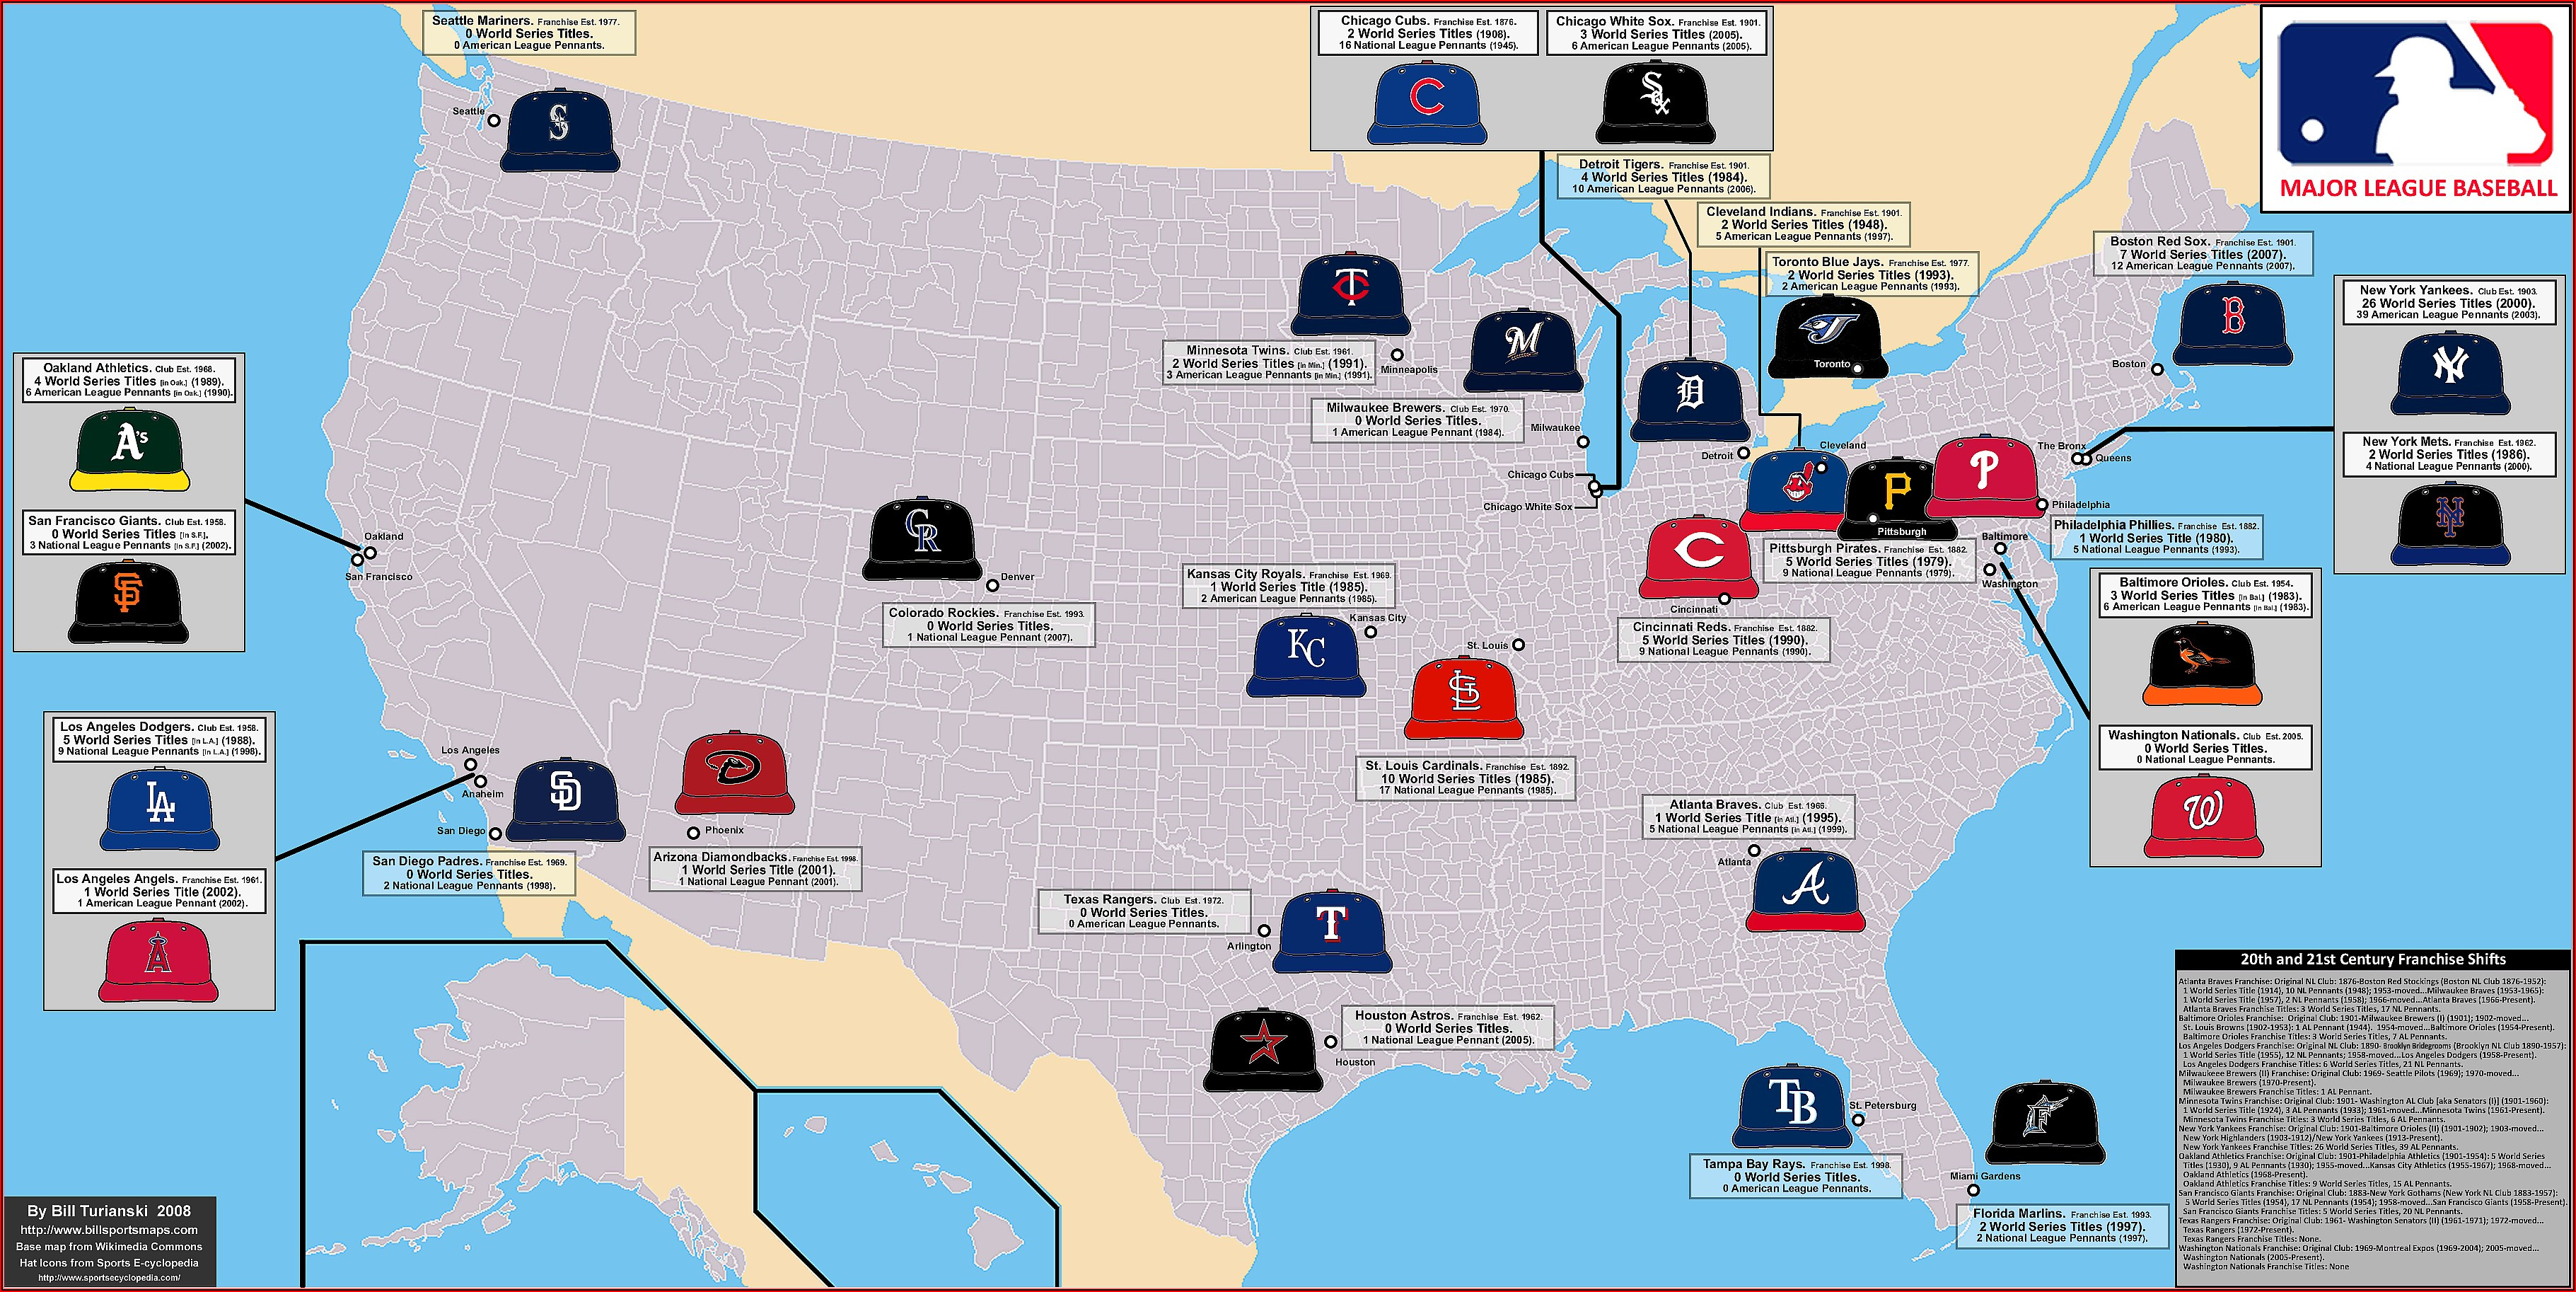 Major League Baseball Cities Map